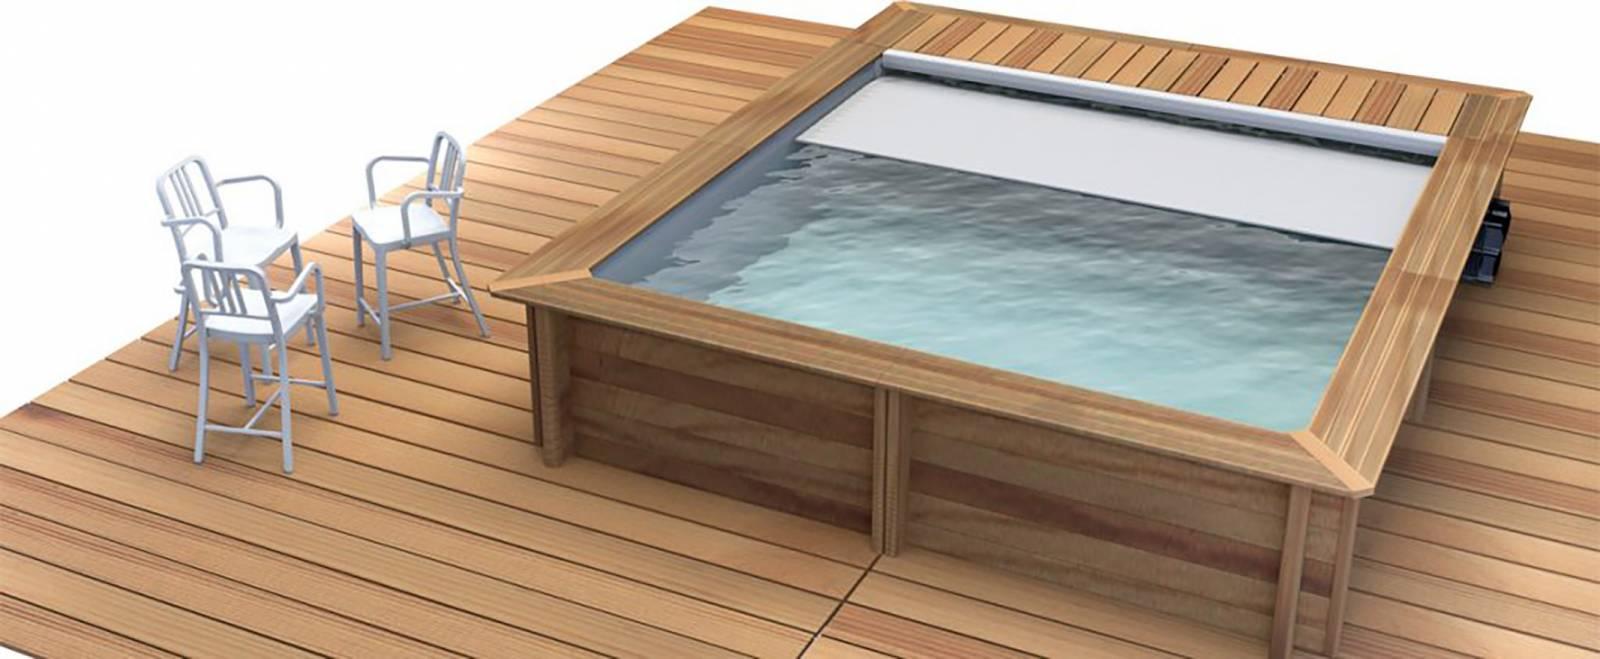 tarif d une piscine bois semi enterree